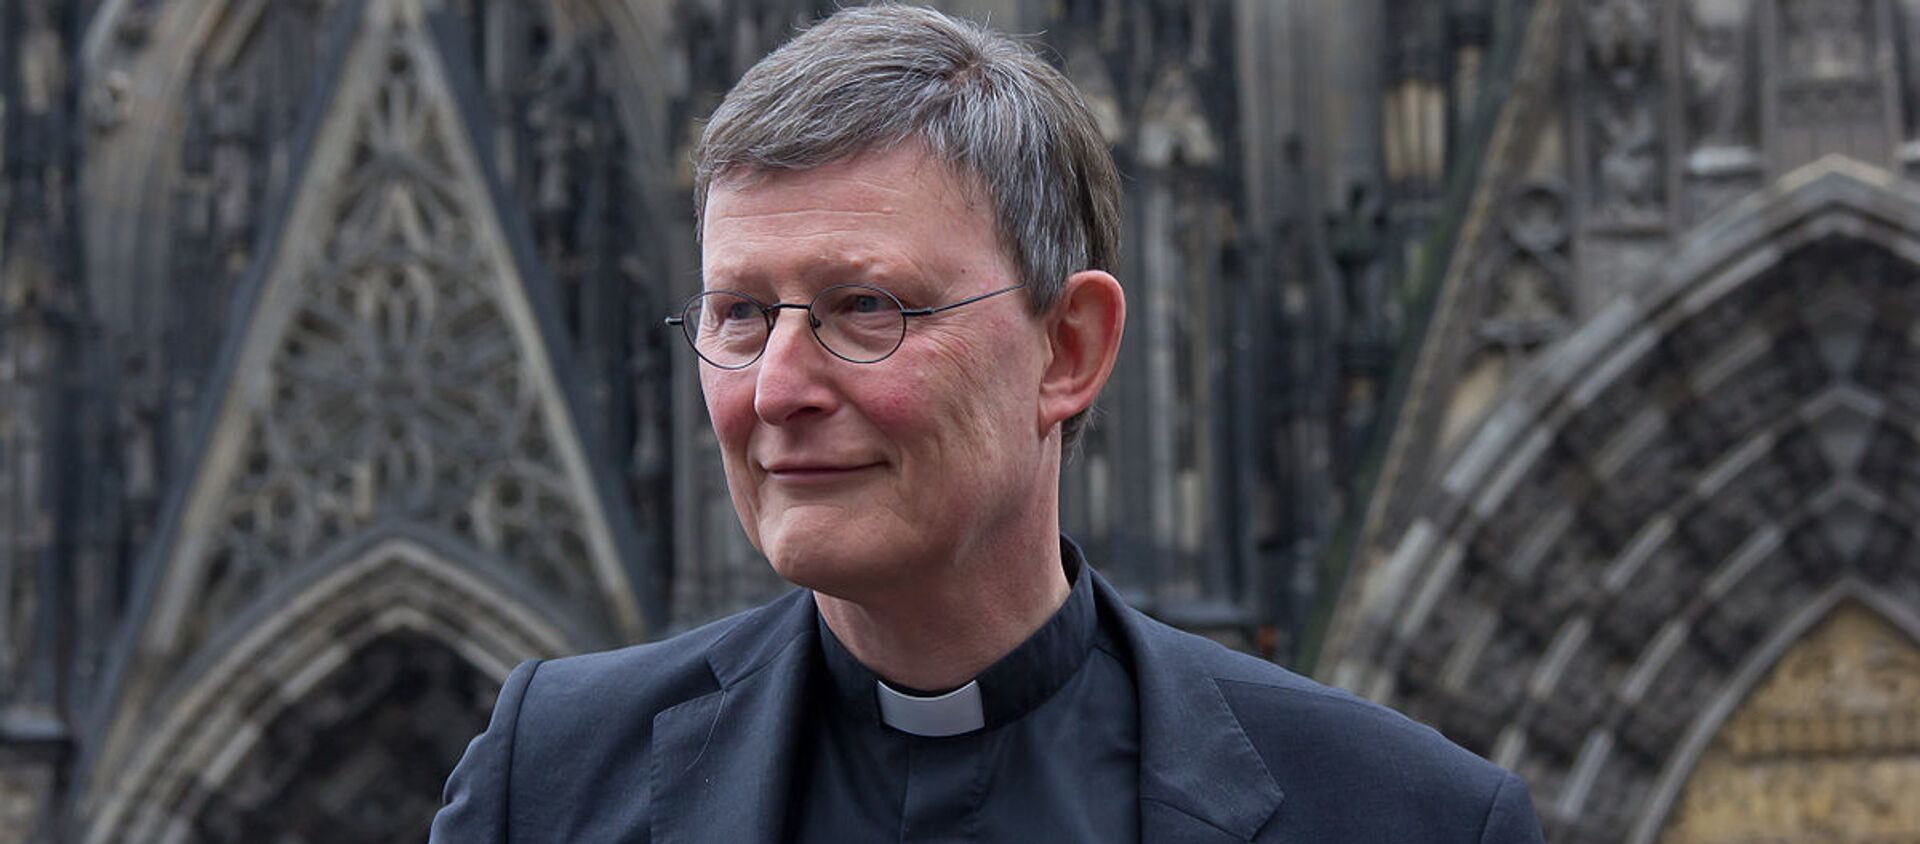 L'arcivescovo di Colonia Rainer Maria Woelki - Sputnik Italia, 1920, 18.03.2021